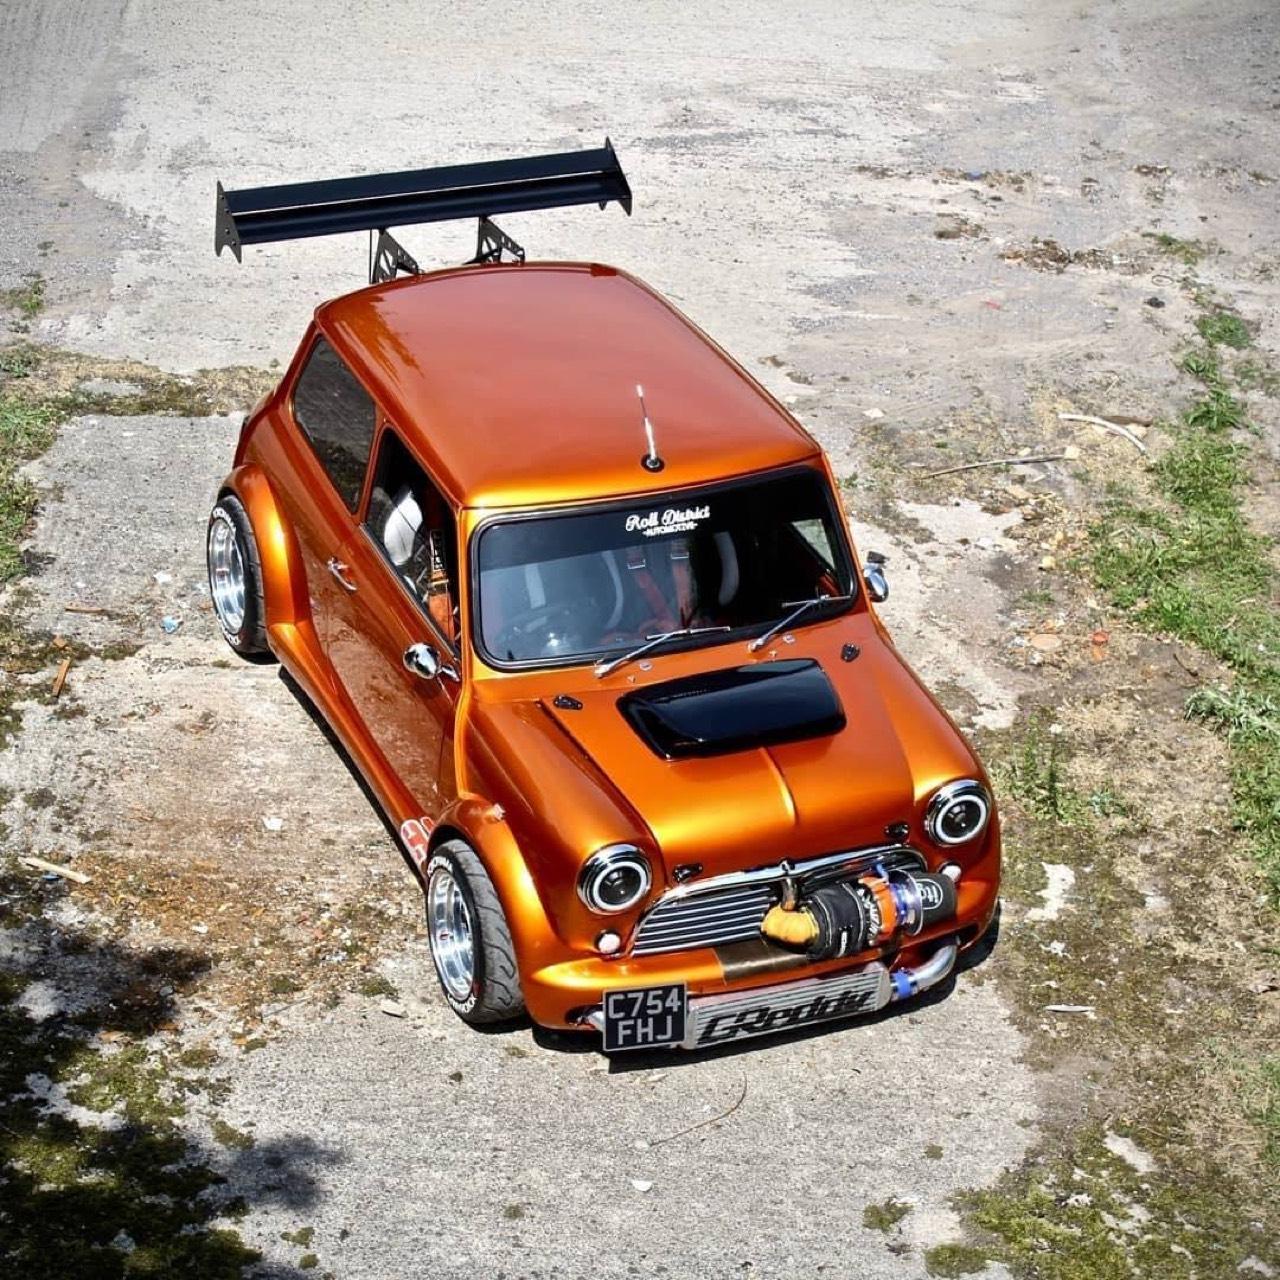 Austin Mini B16 Turbo... Shootée aux hormones ! 17